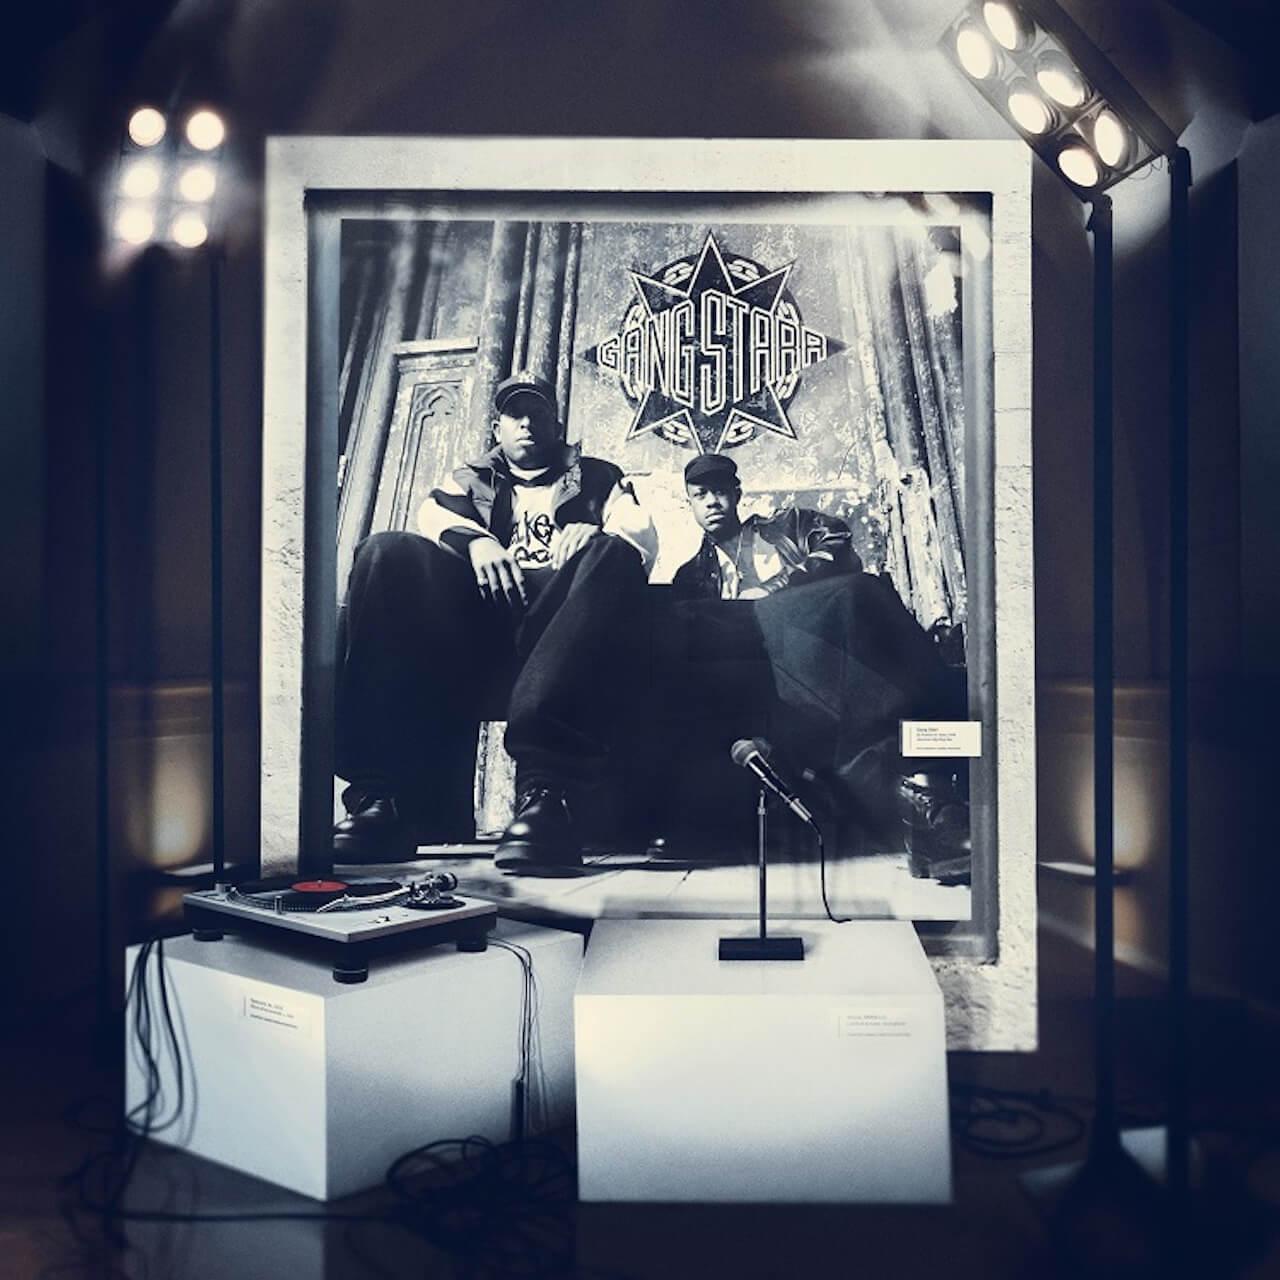 Gang Starr、16年ぶりのアルバム『One Of The Best Yet』がリリース J. Cole、Q-Tip、Ne-Yo、Talib Kweliらが参加 music191101-gangstarr